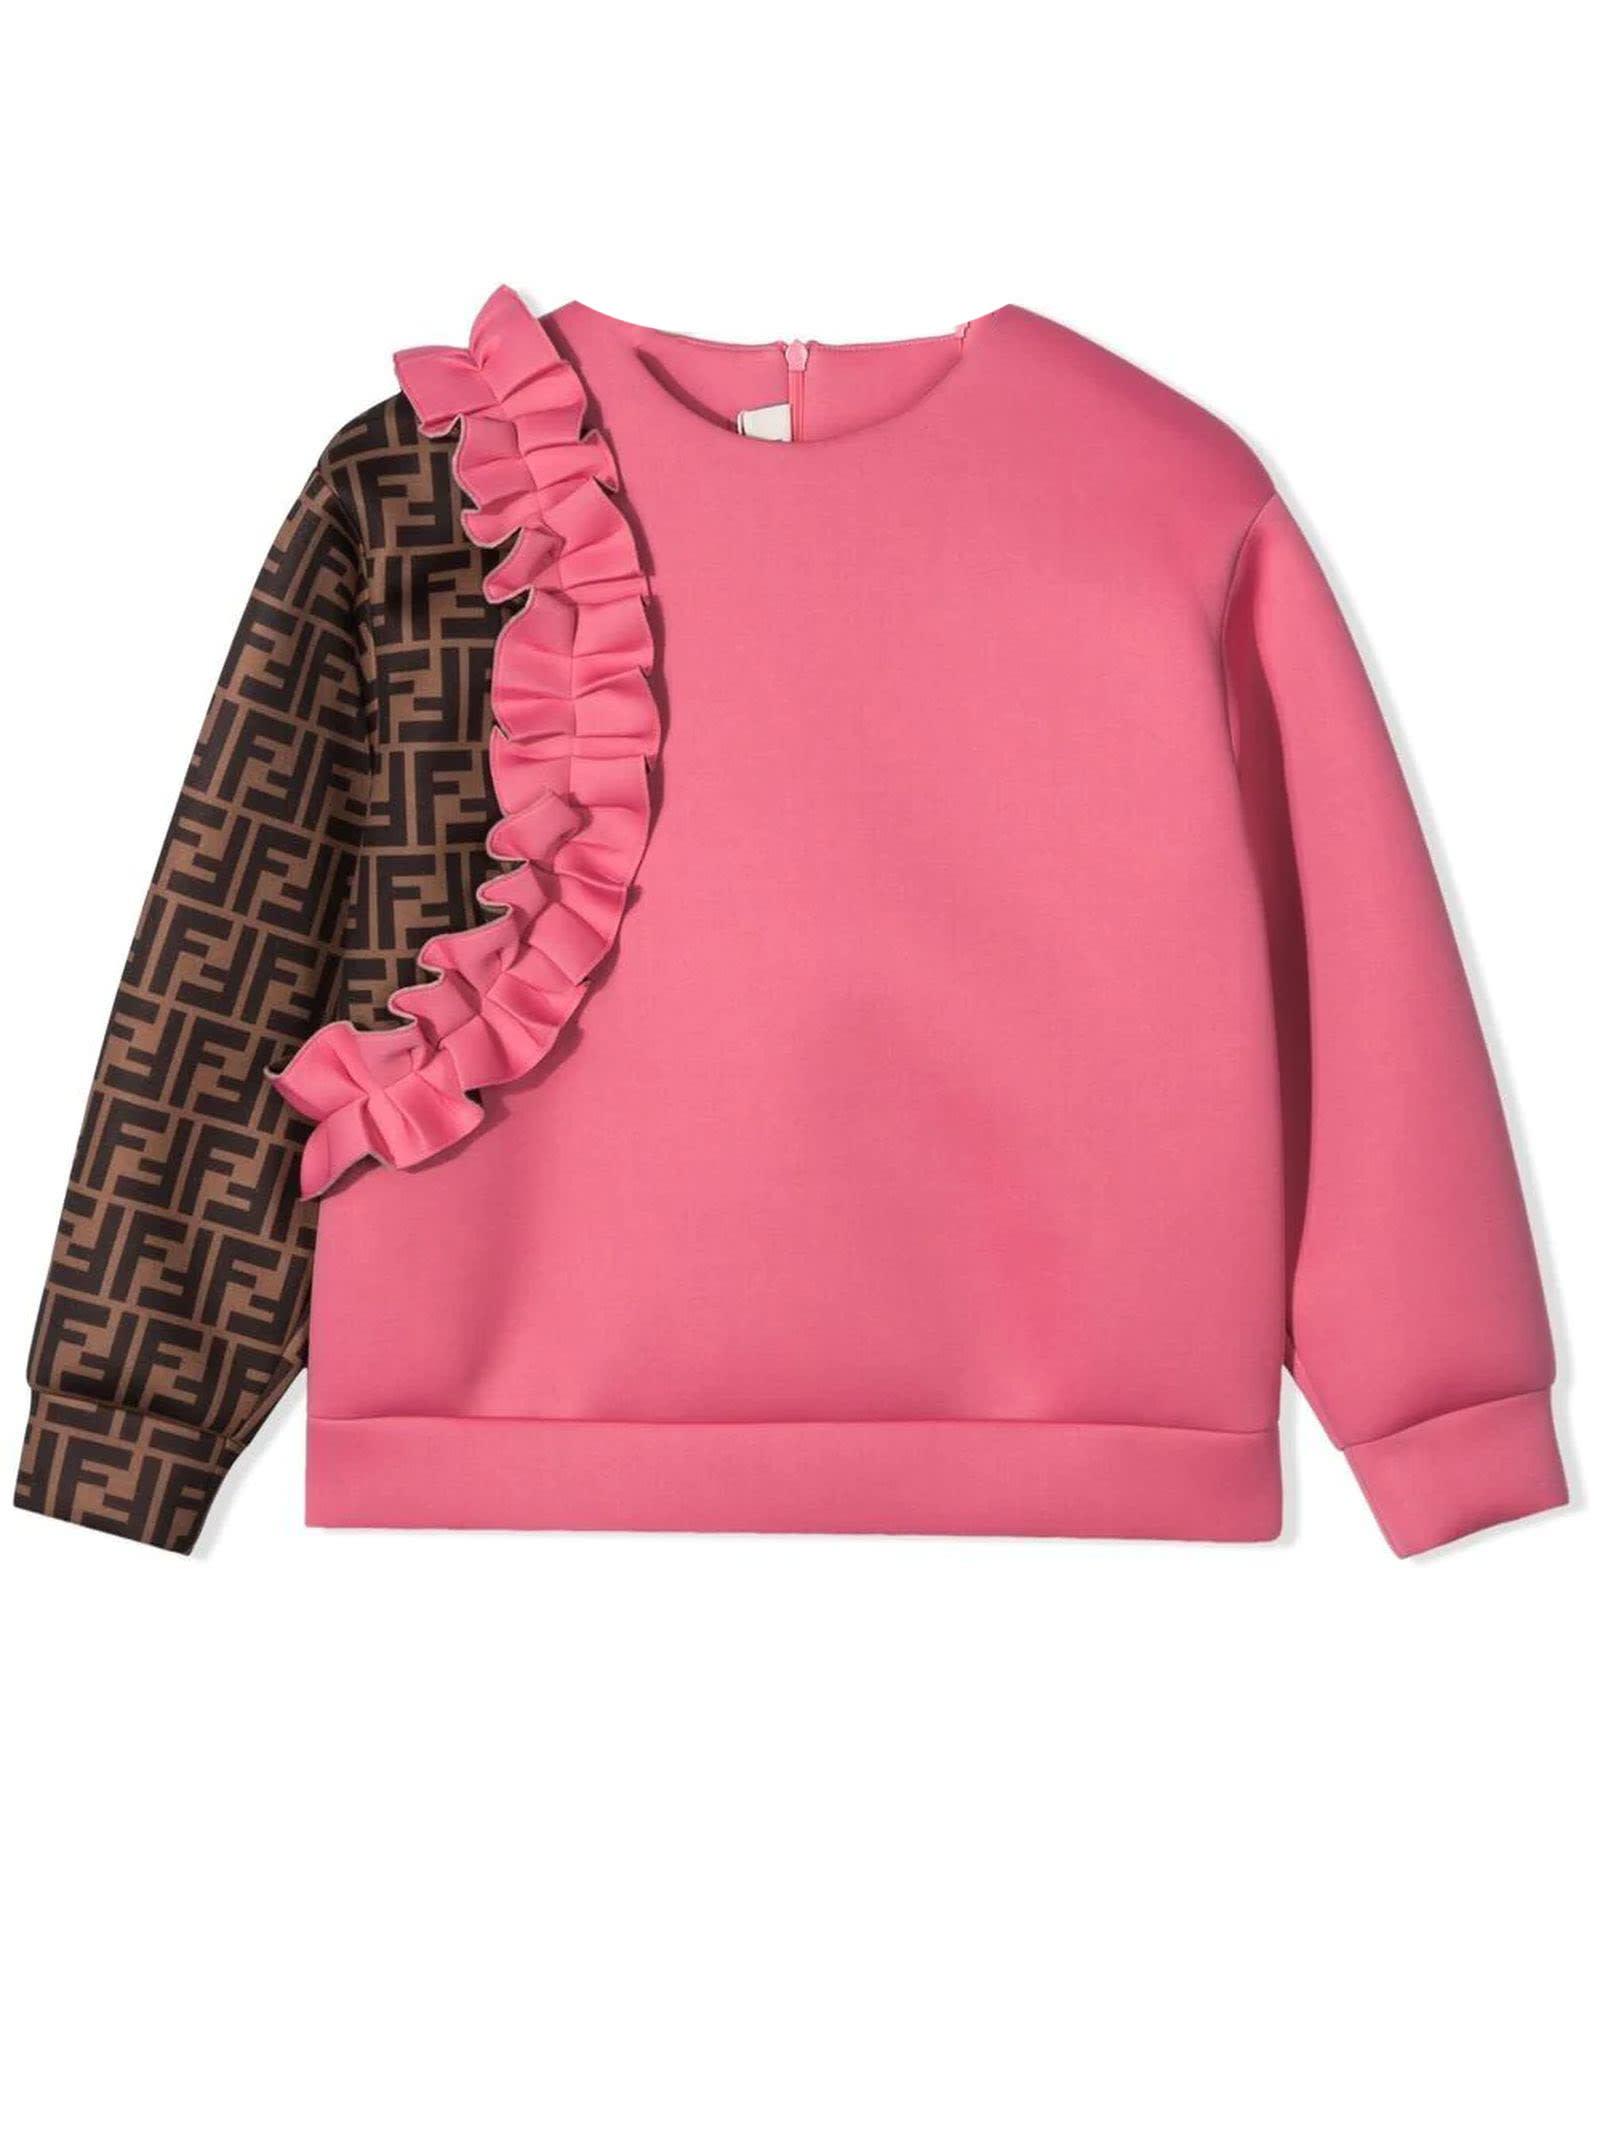 Fendi Sweatshirts PINK AND BROWN SWEATSHIRT